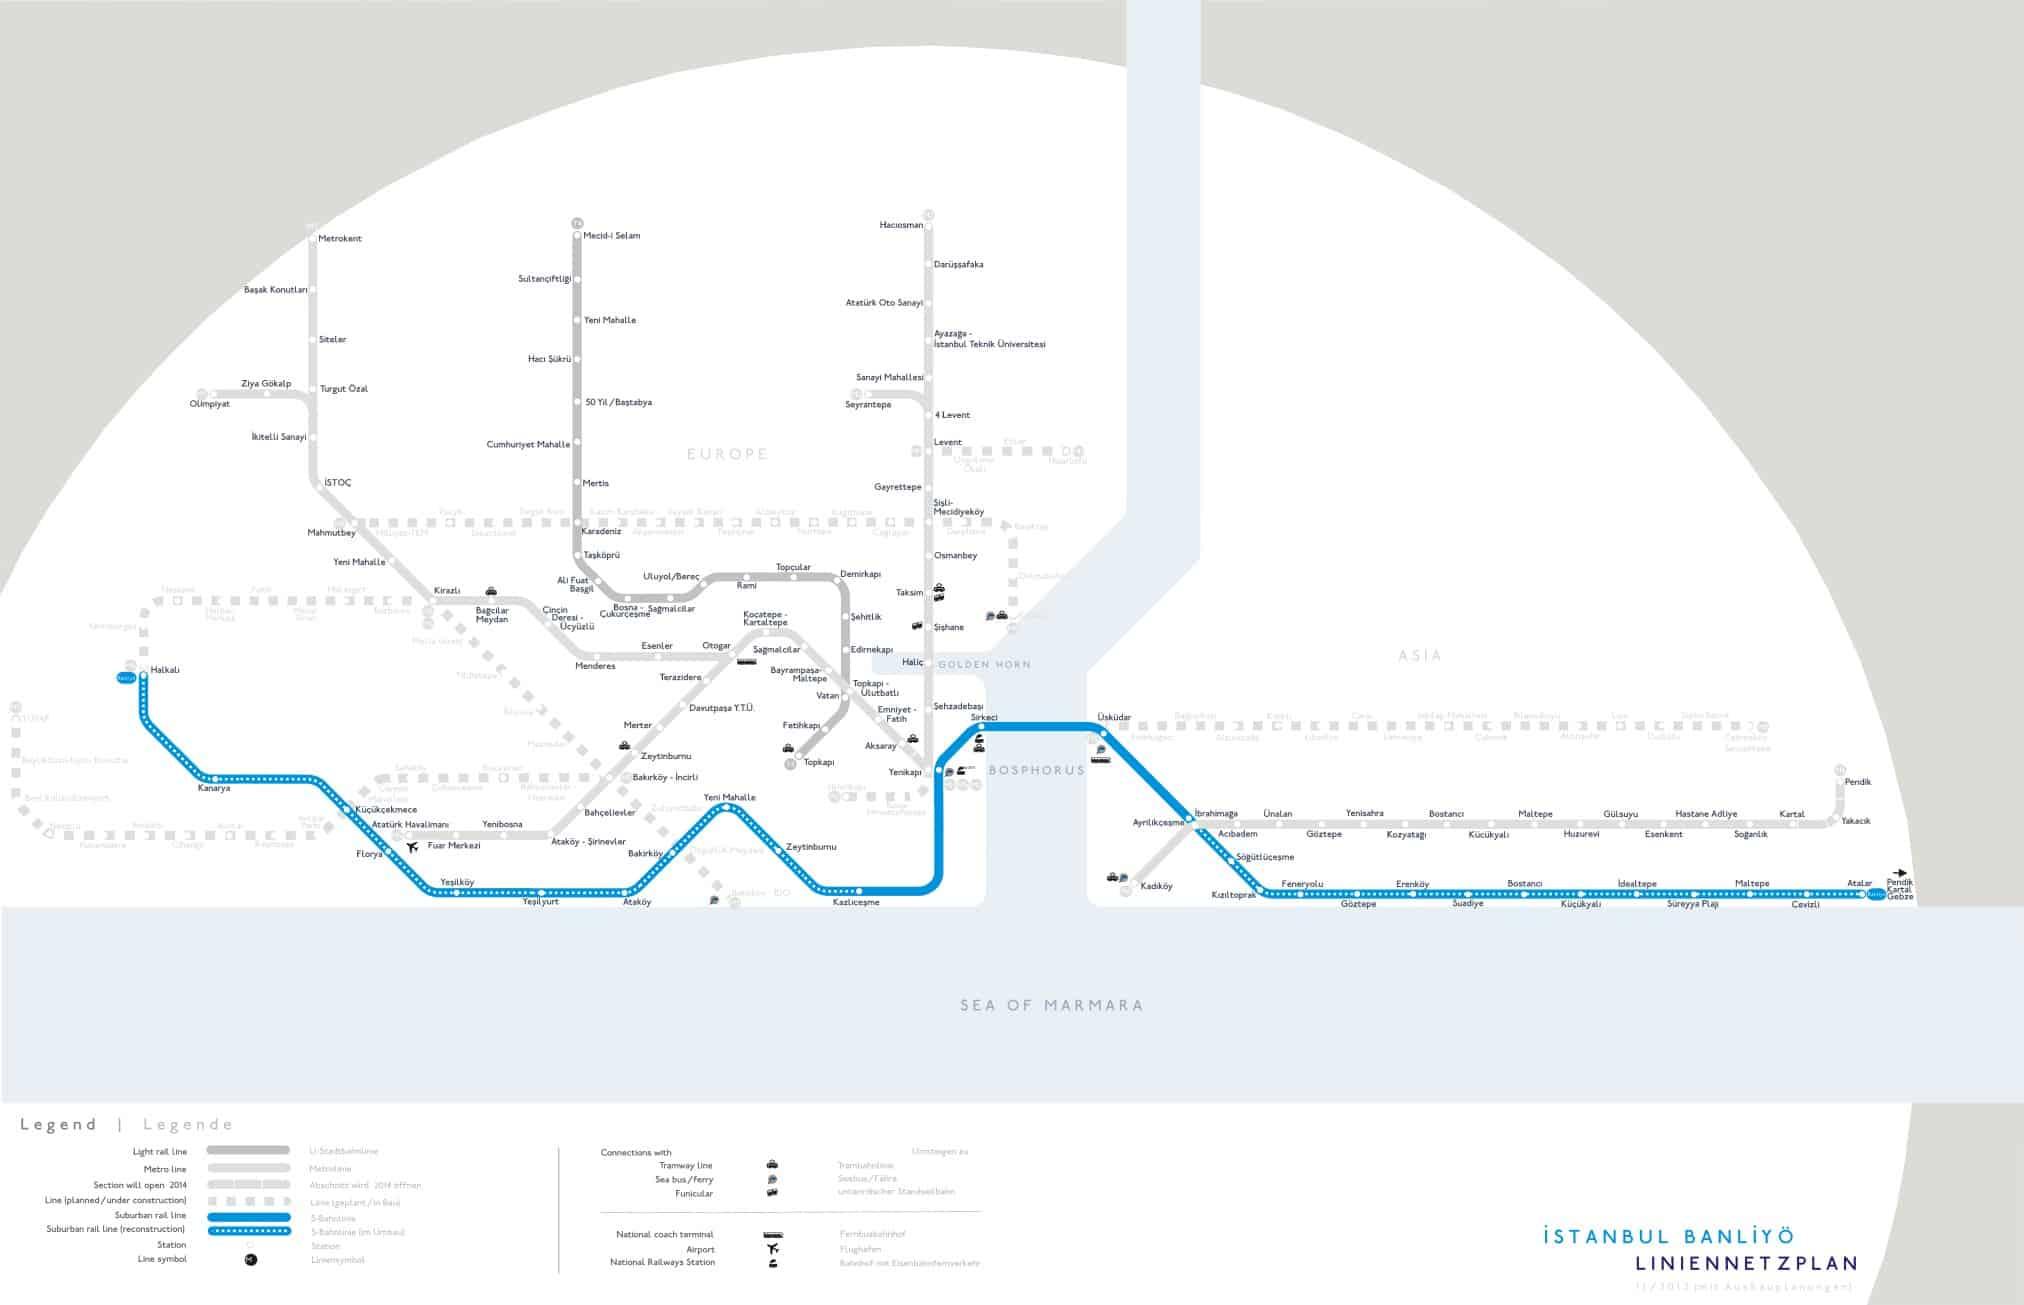 Marmaray suburban train line map